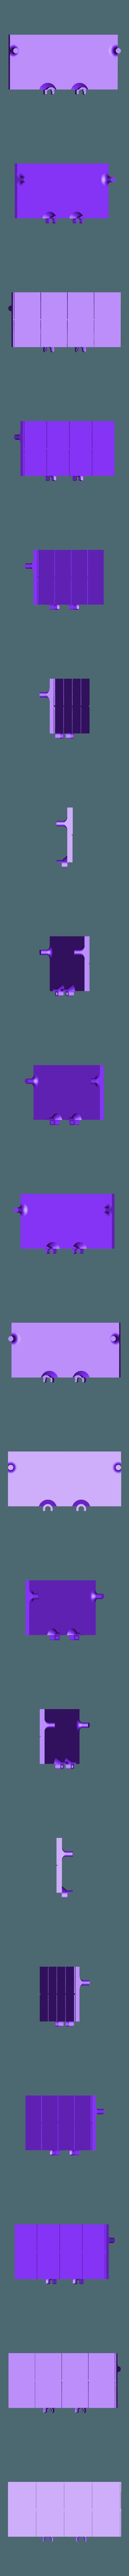 Parte_suelta.stl Download free STL file Tablero de ajedrez desplegable • 3D print object, alexanderegido